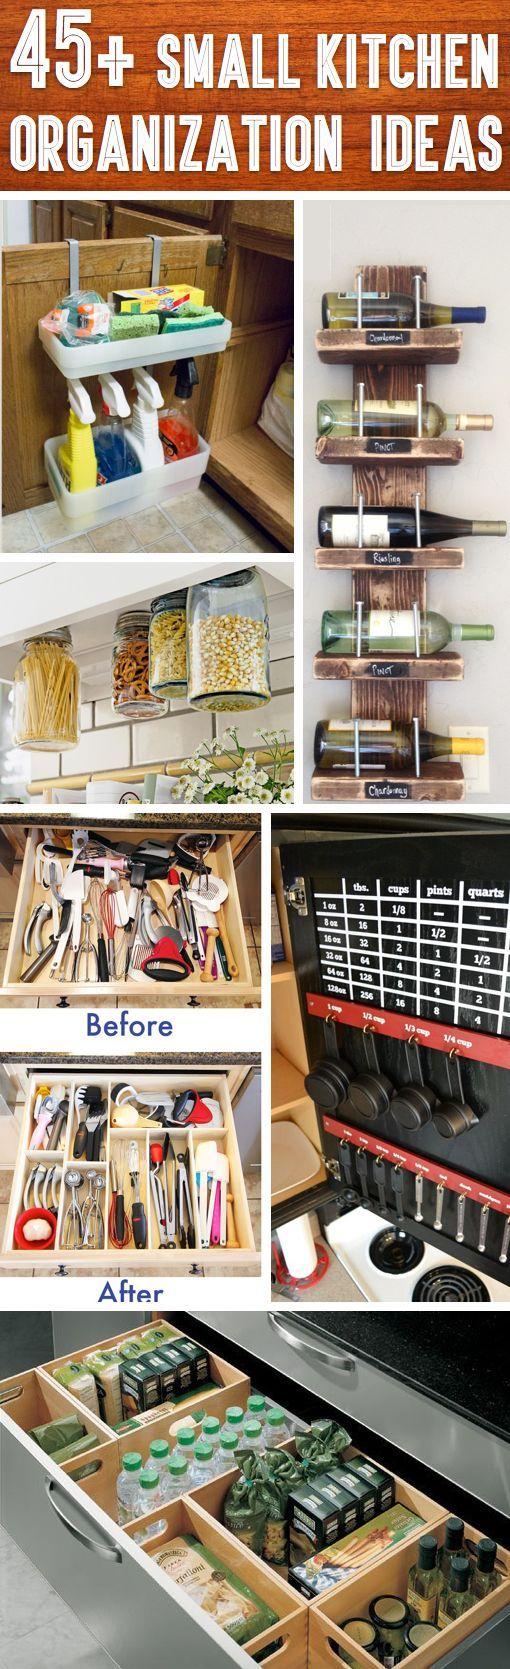 45++Small+Kitchen+Organization+And+DIY+Storage+Ideas